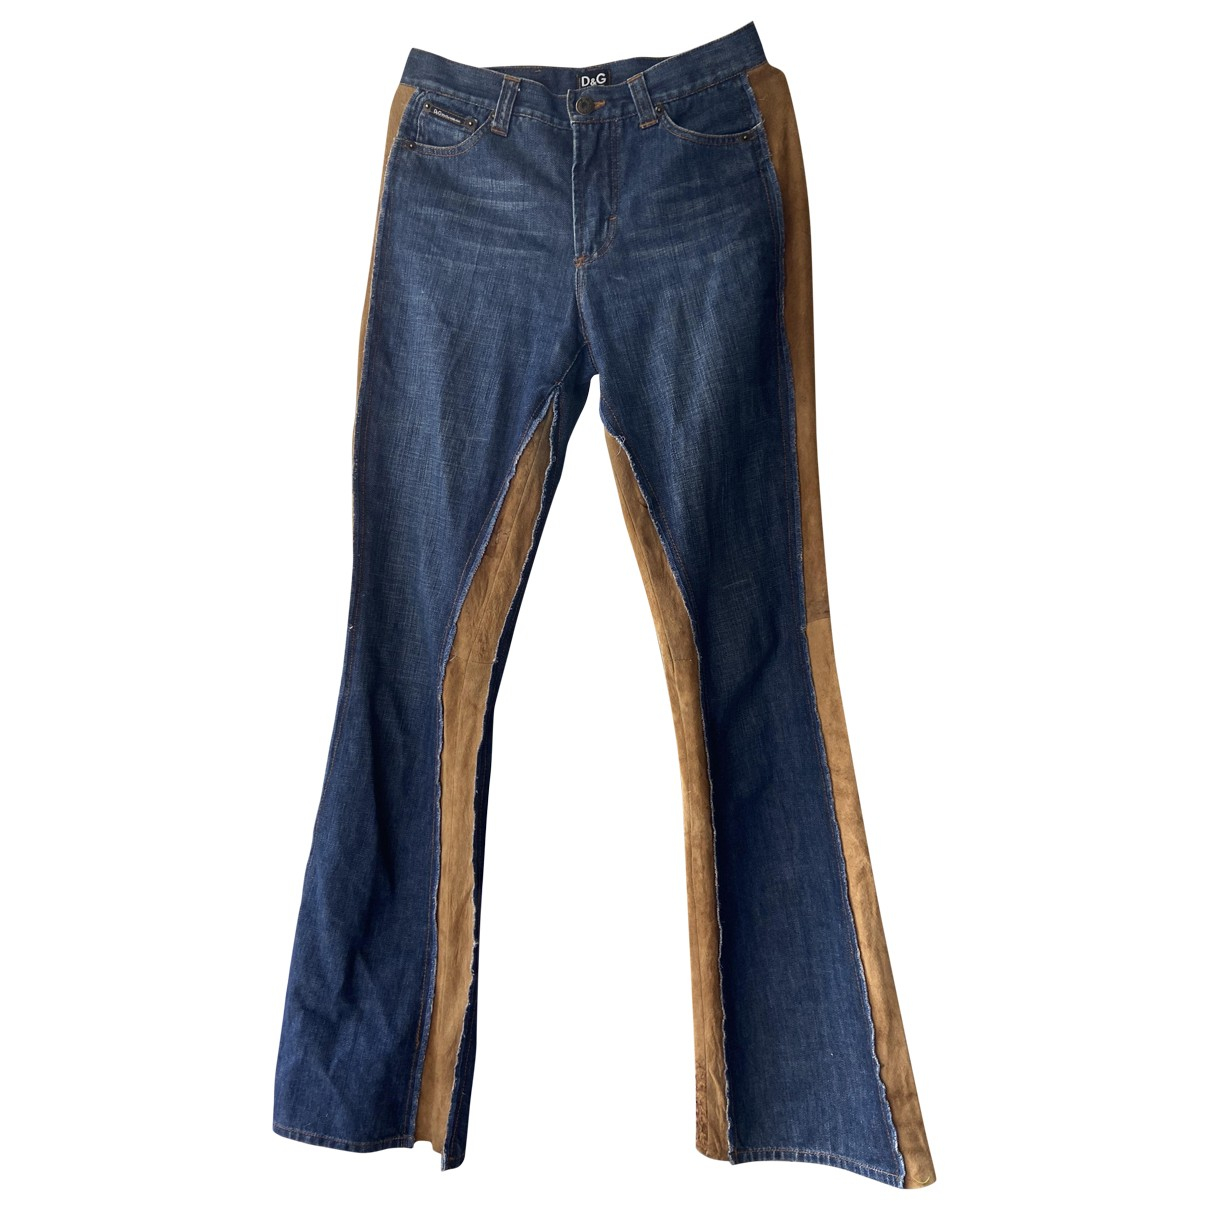 D&g \N Jeans in  Blau Denim - Jeans